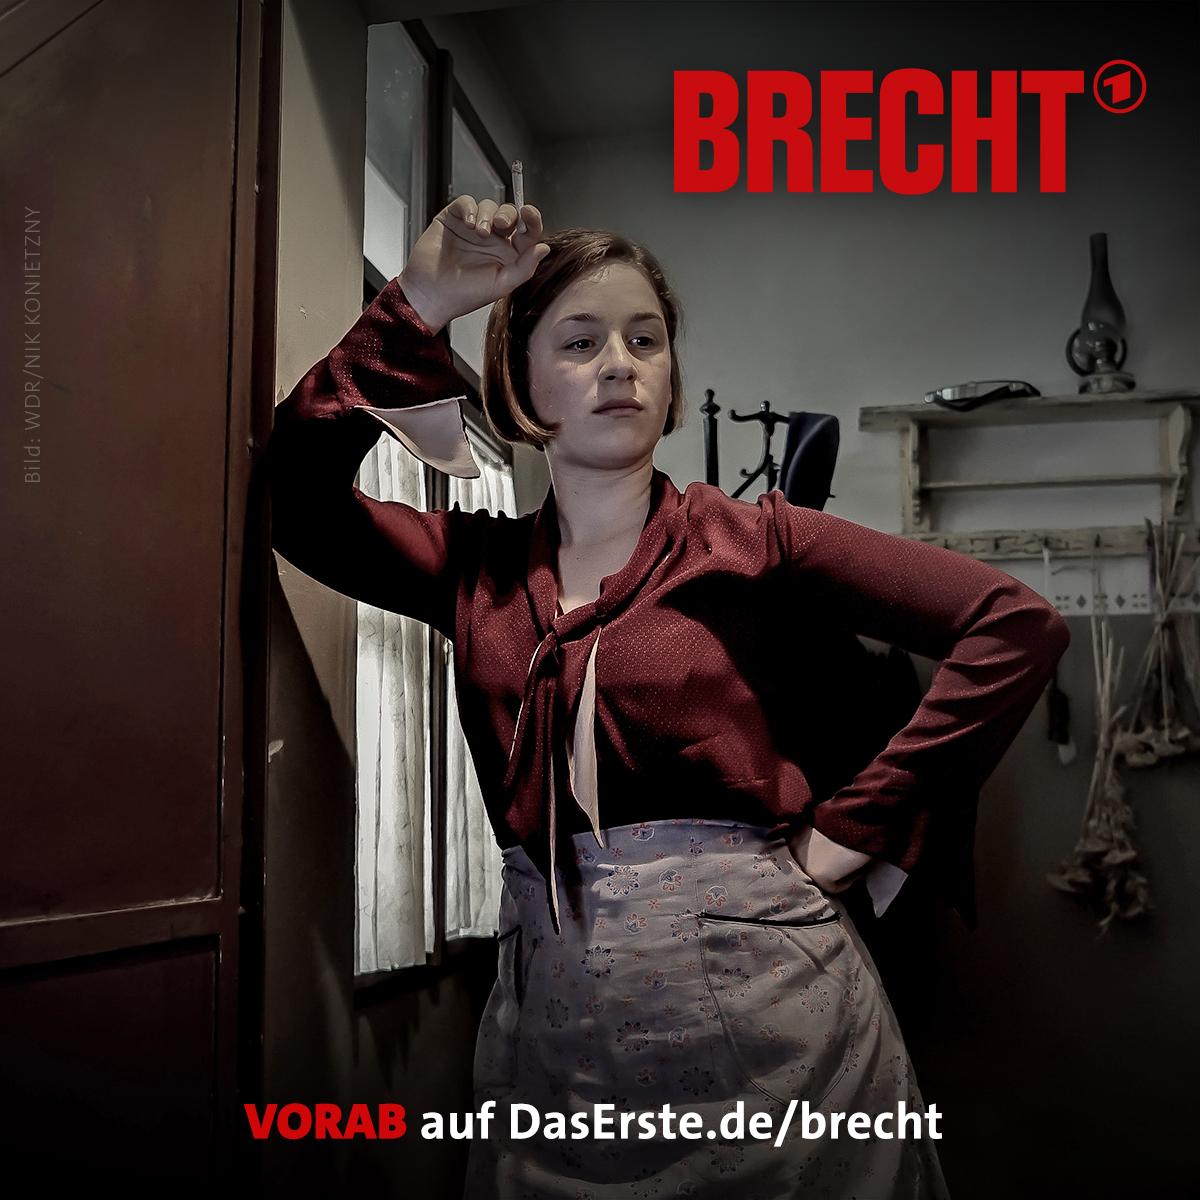 brecht_lou_strenger_vorab.jpg